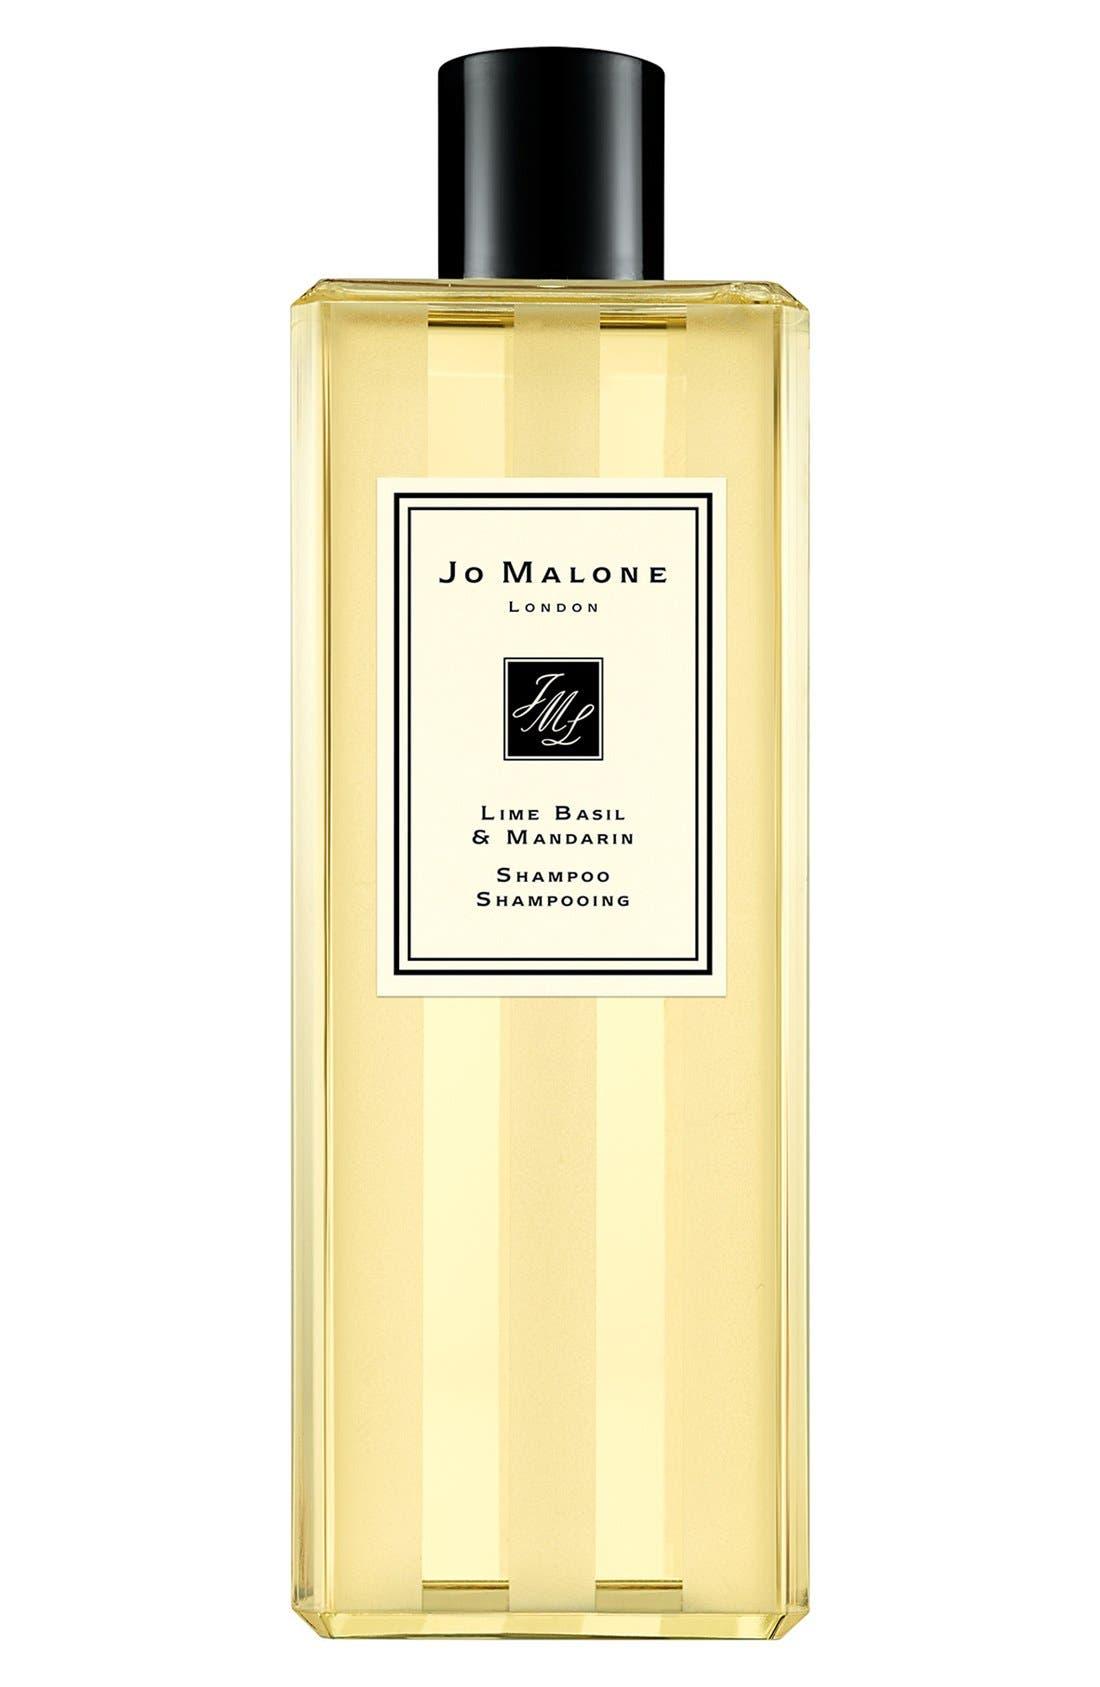 Jo Malone London™ Lime Basil & Mandarin Shampoo